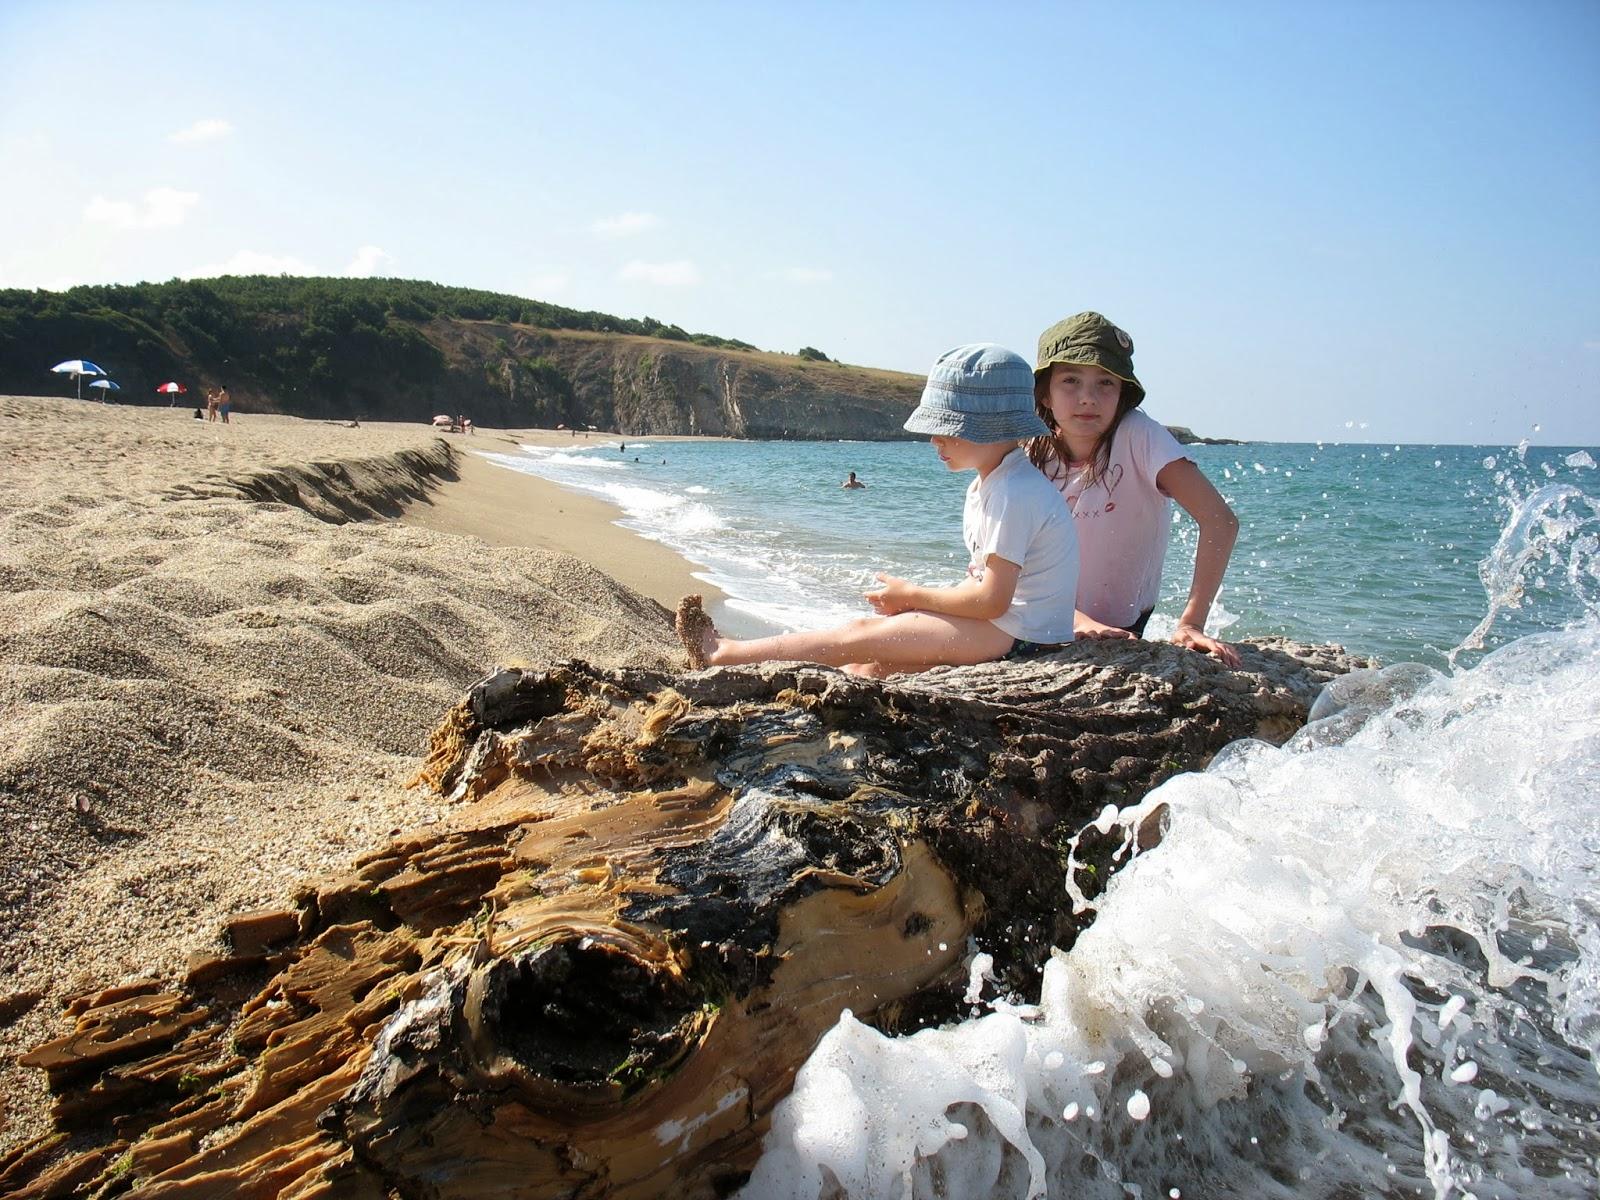 Sinemoretz pláž v Bulharsku